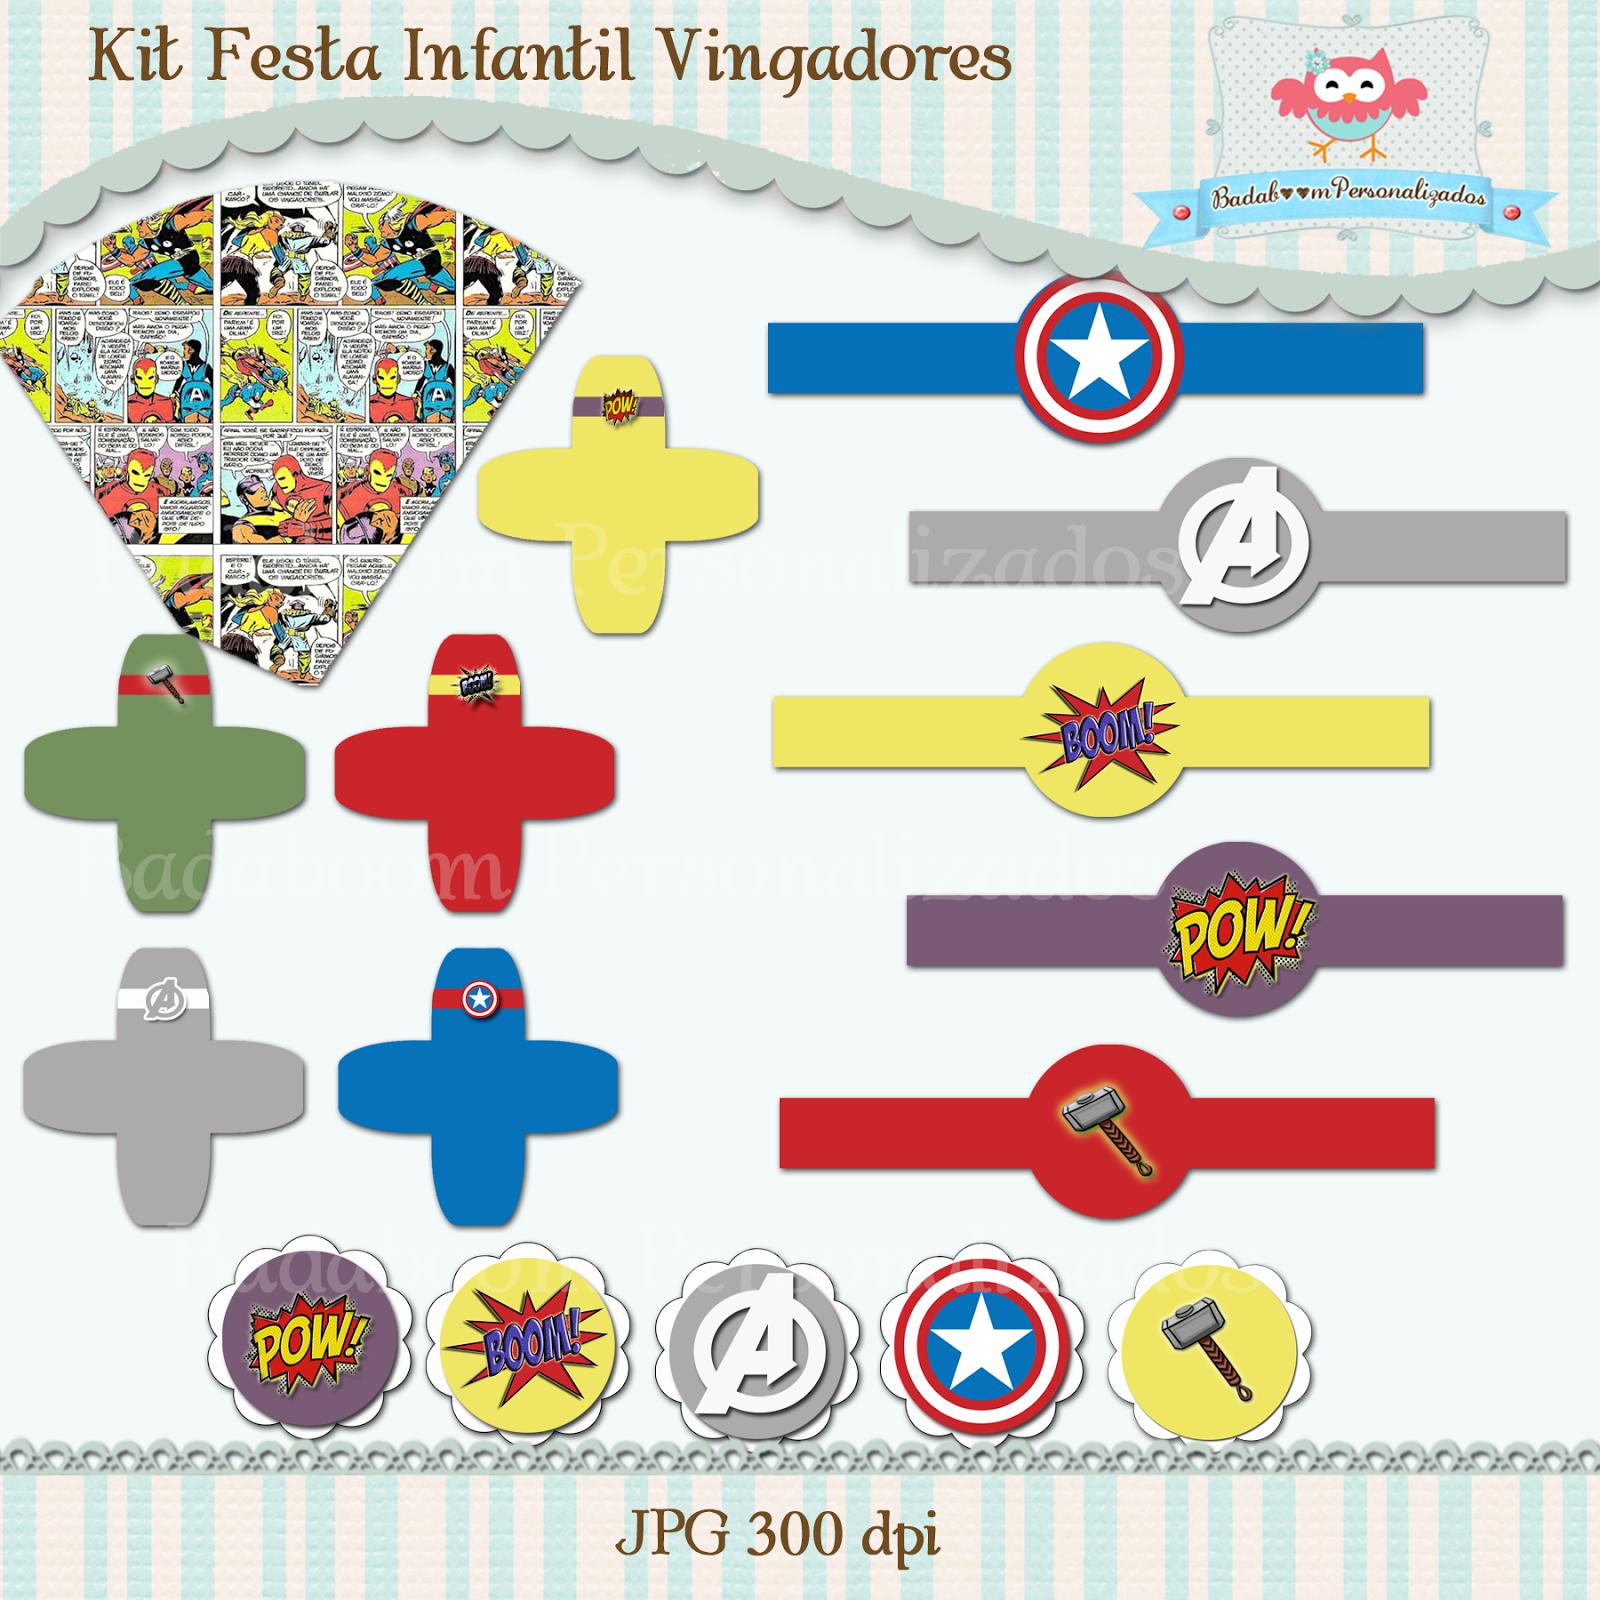 Badaboom Personalizados Kit Festa Infantil Vingadores